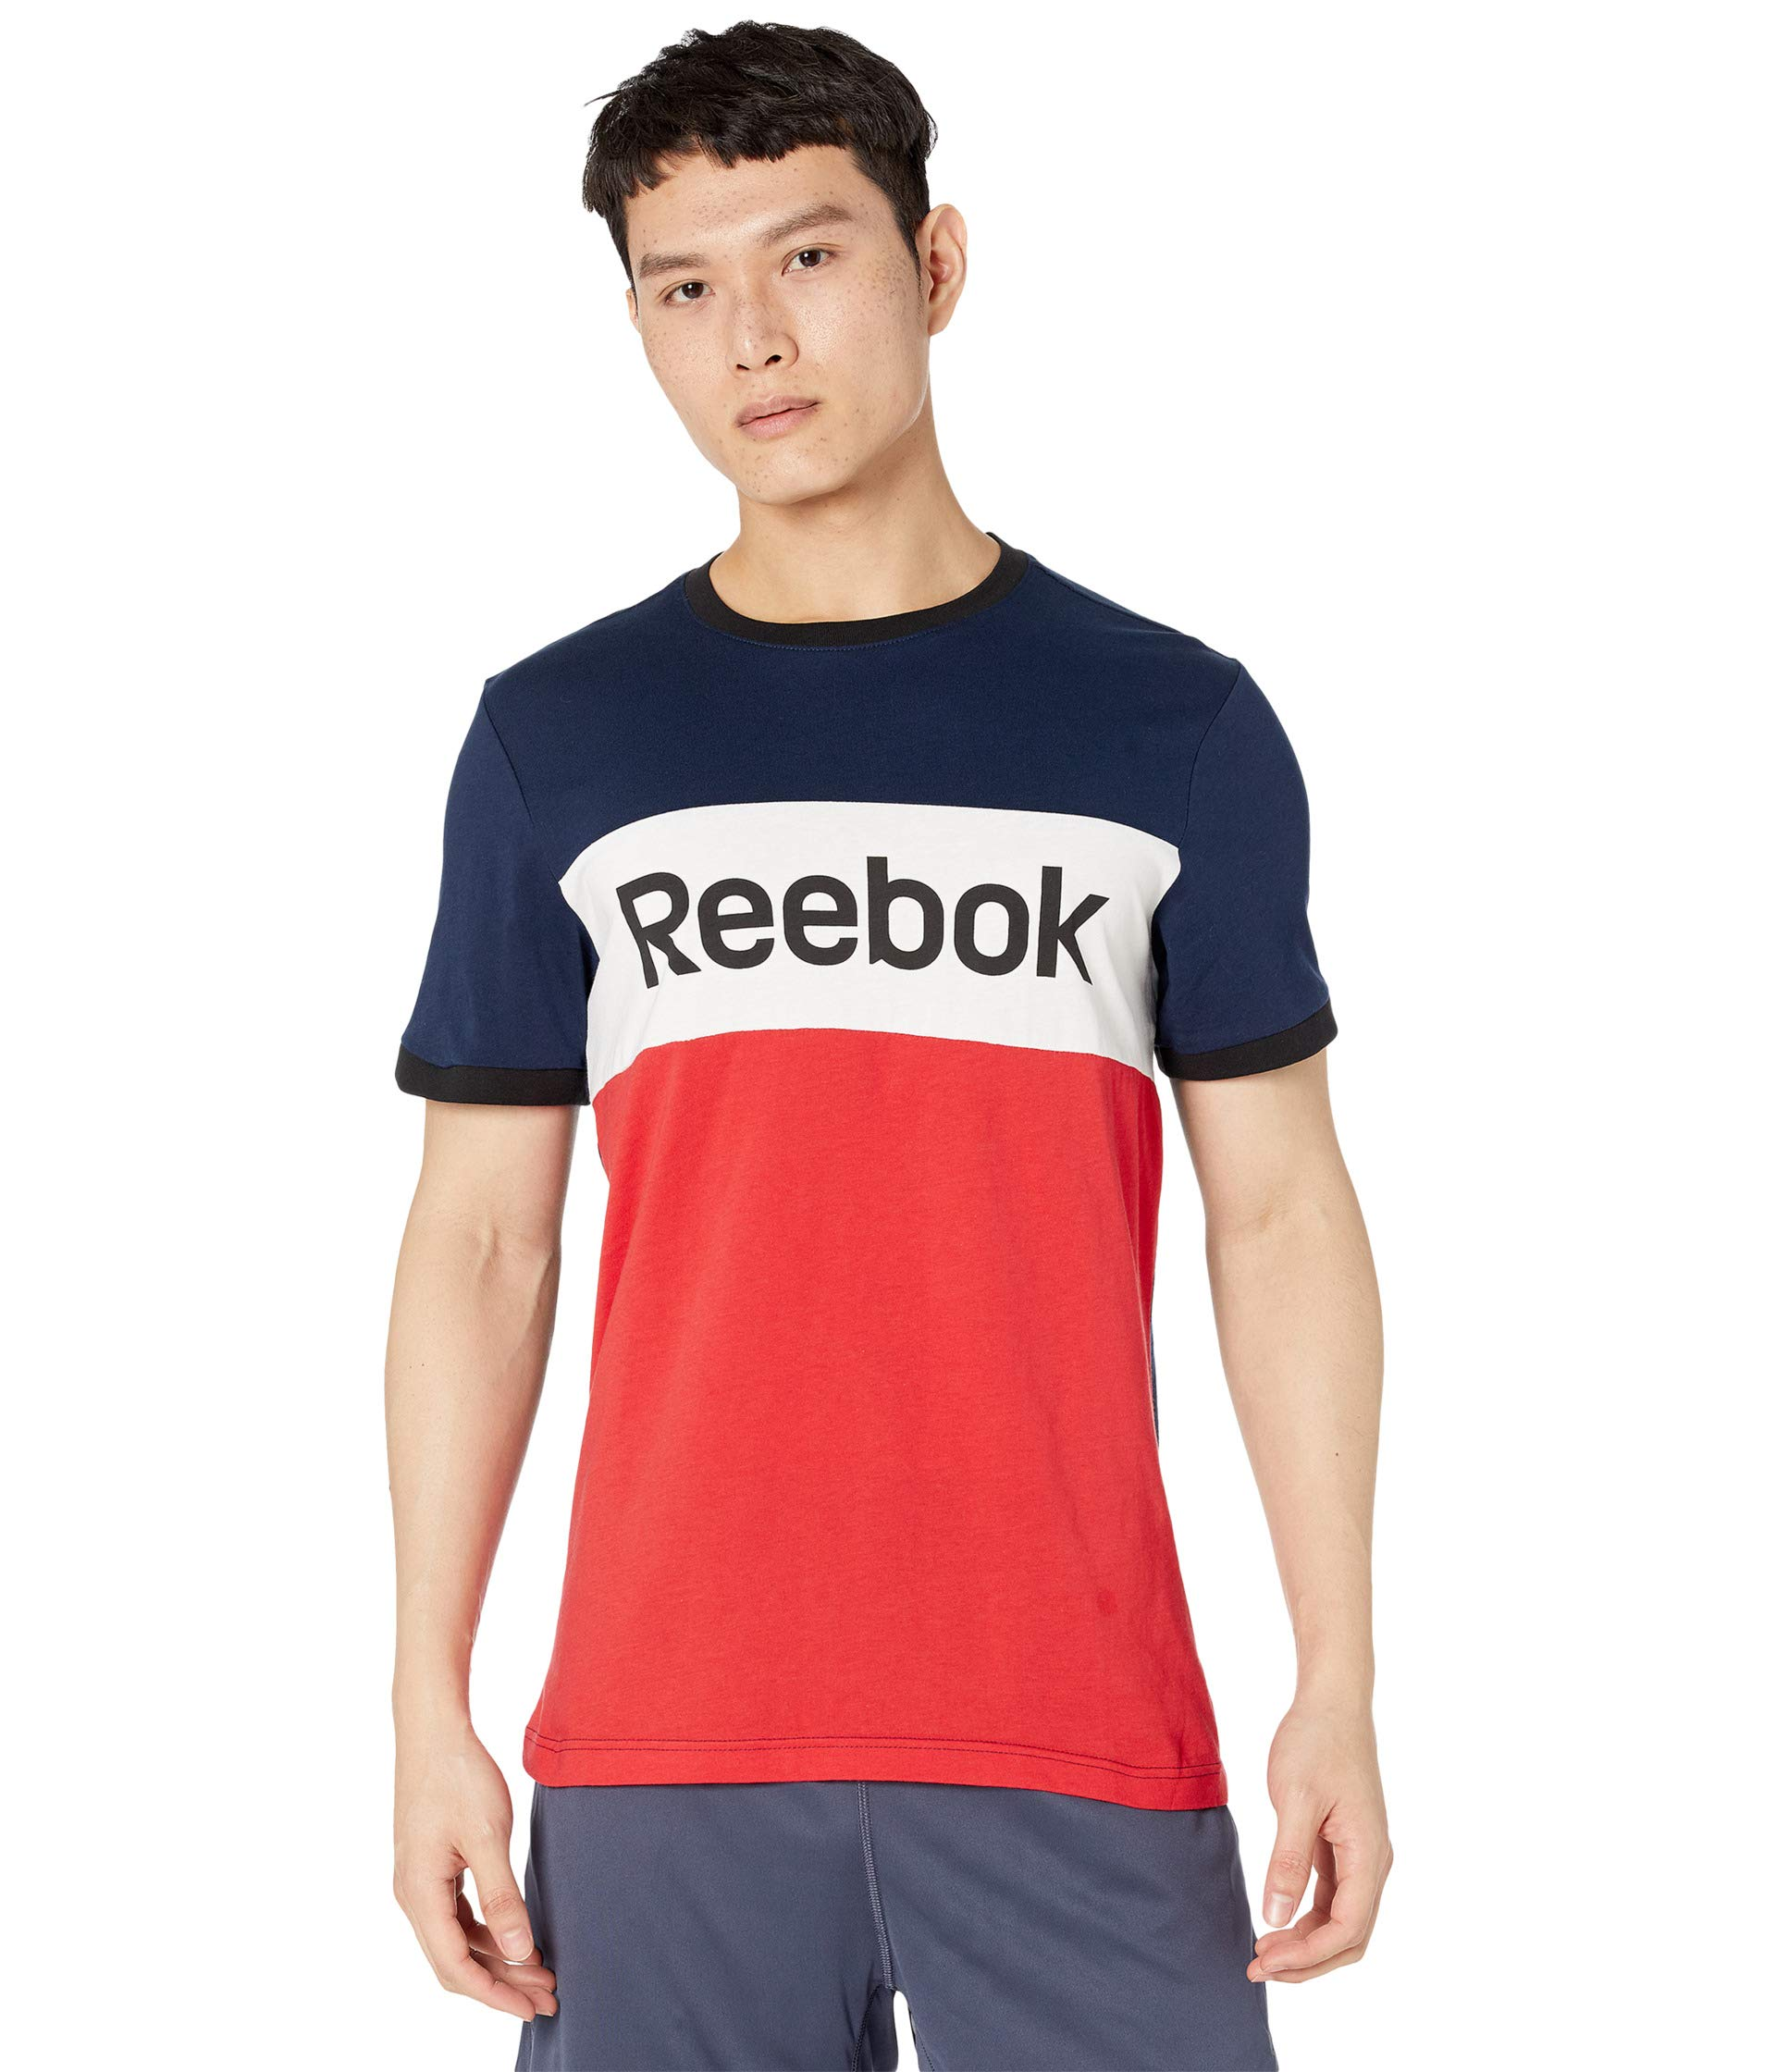 Reebok Training Essentials Blocked Short Sleeve Tee